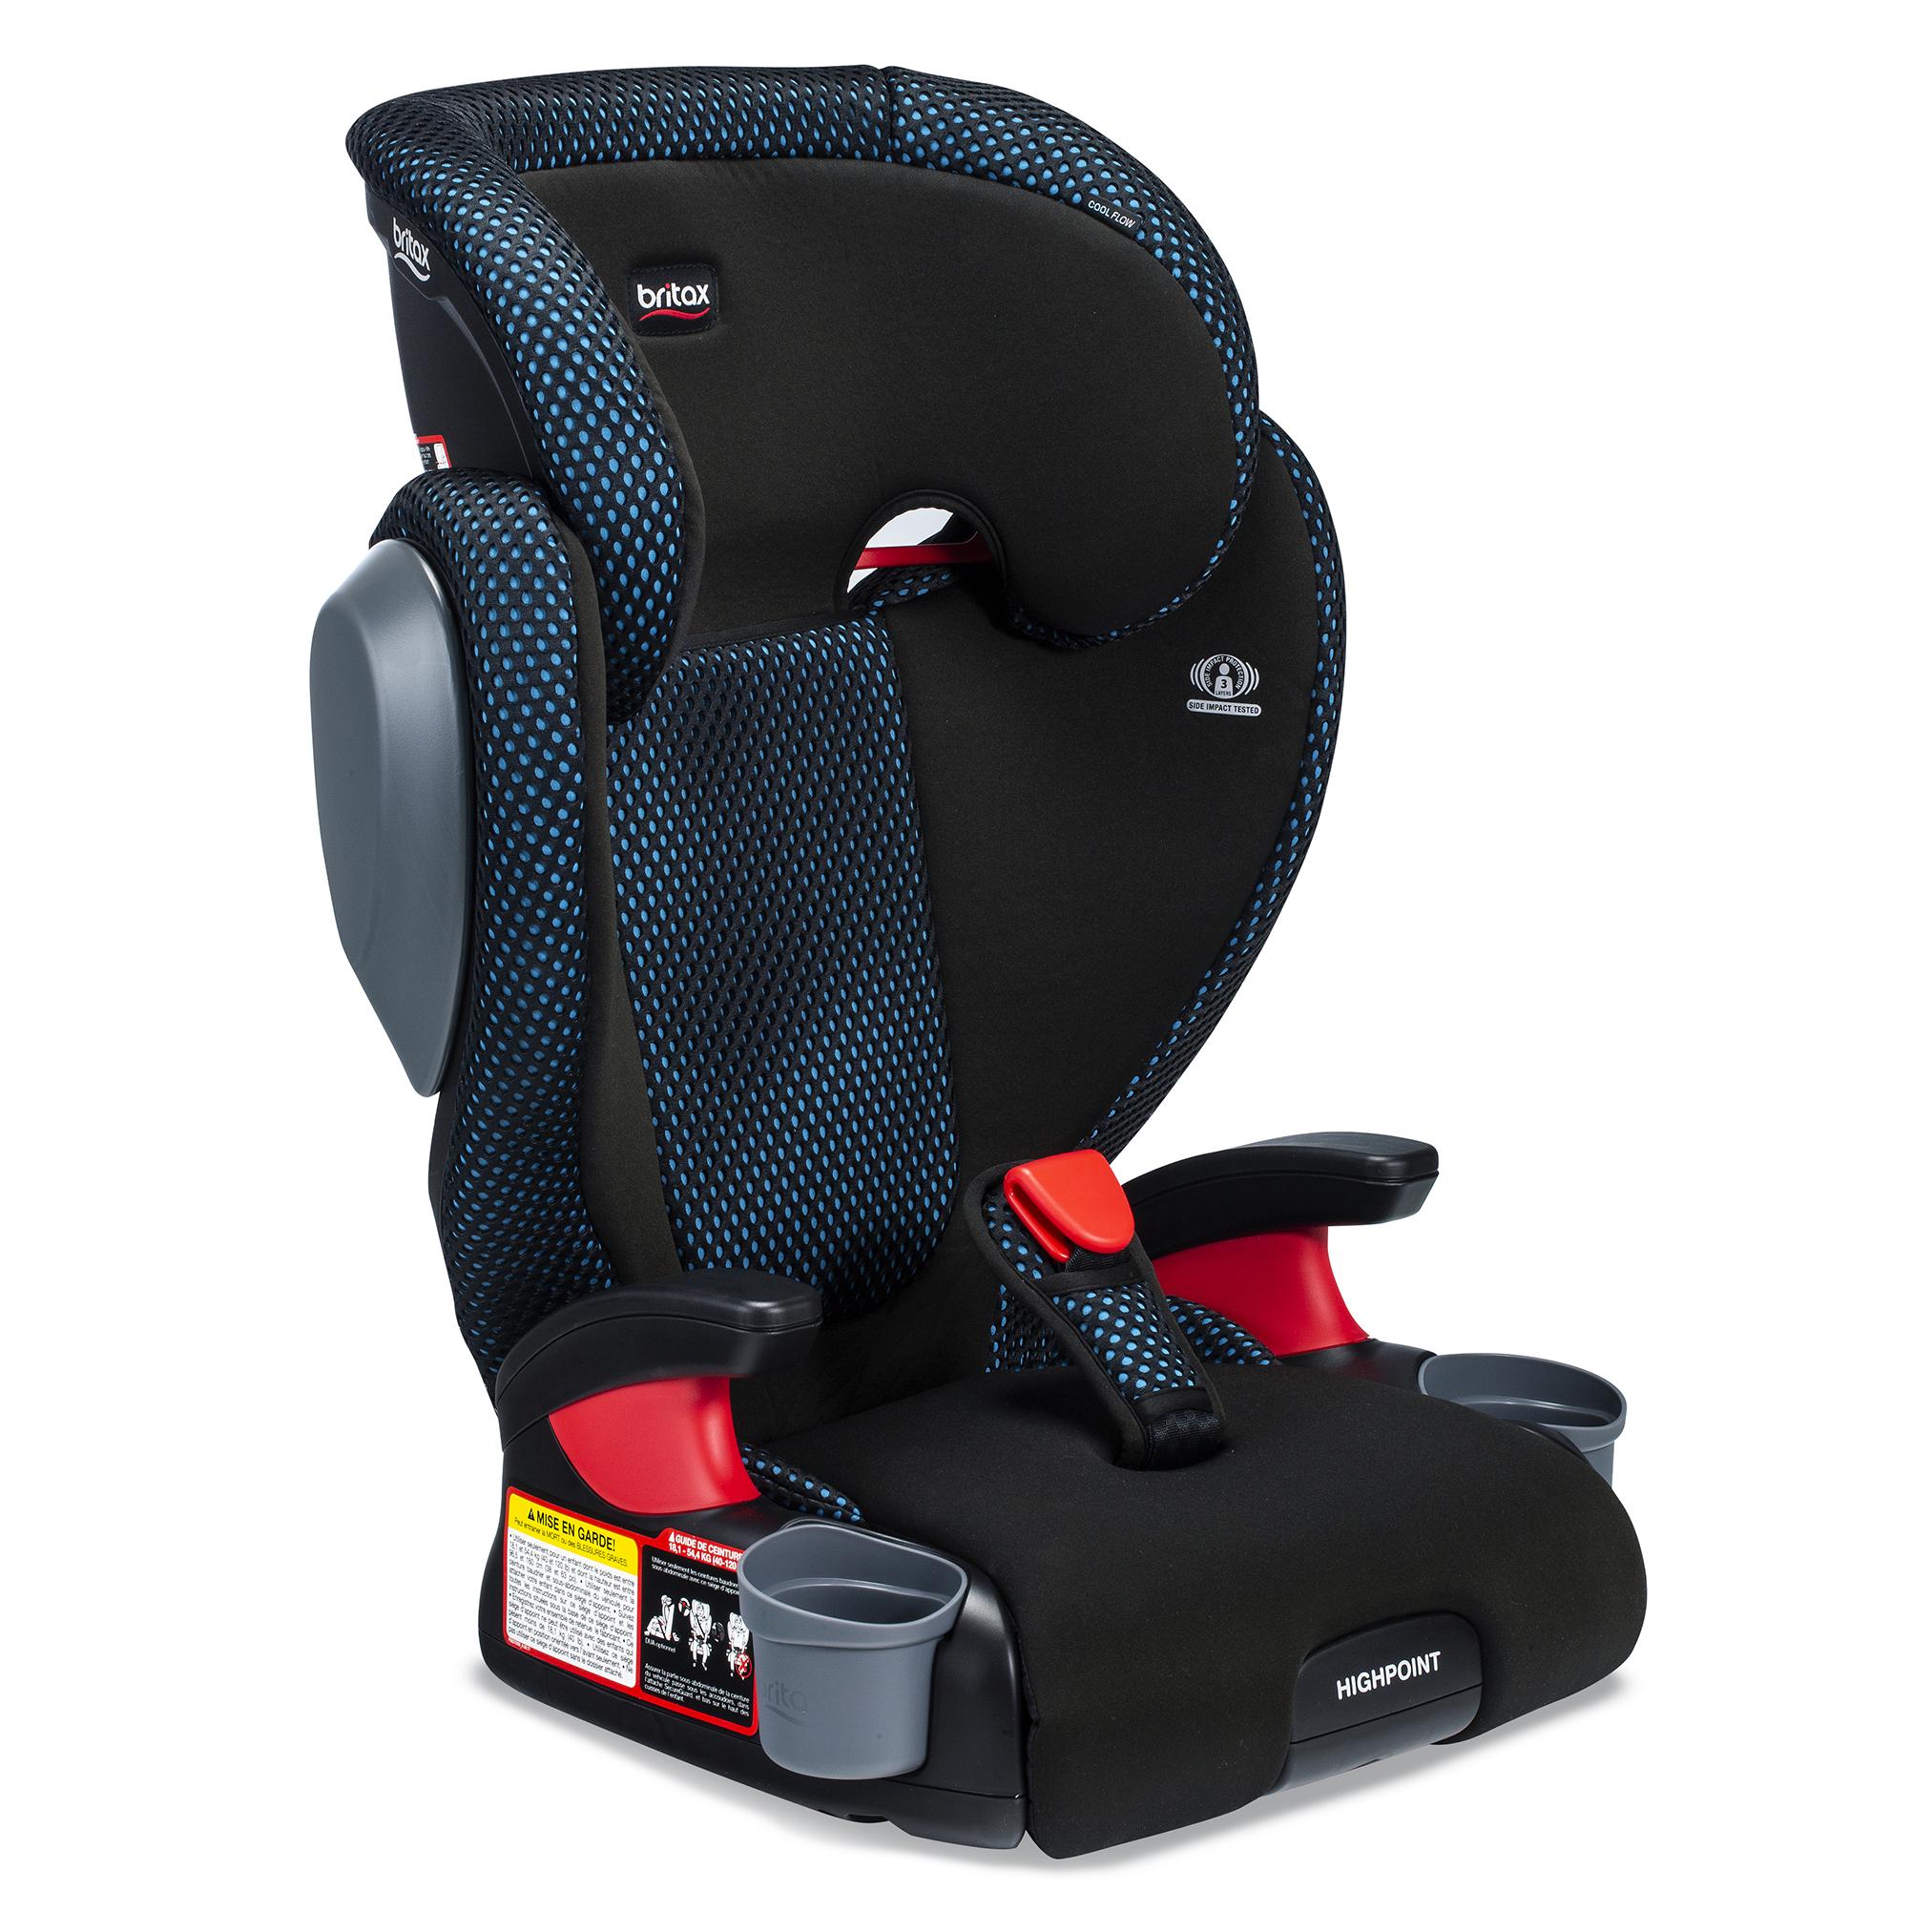 Britax Highpoint Cool Flow Belt-Positioning Booster Seat, Teal